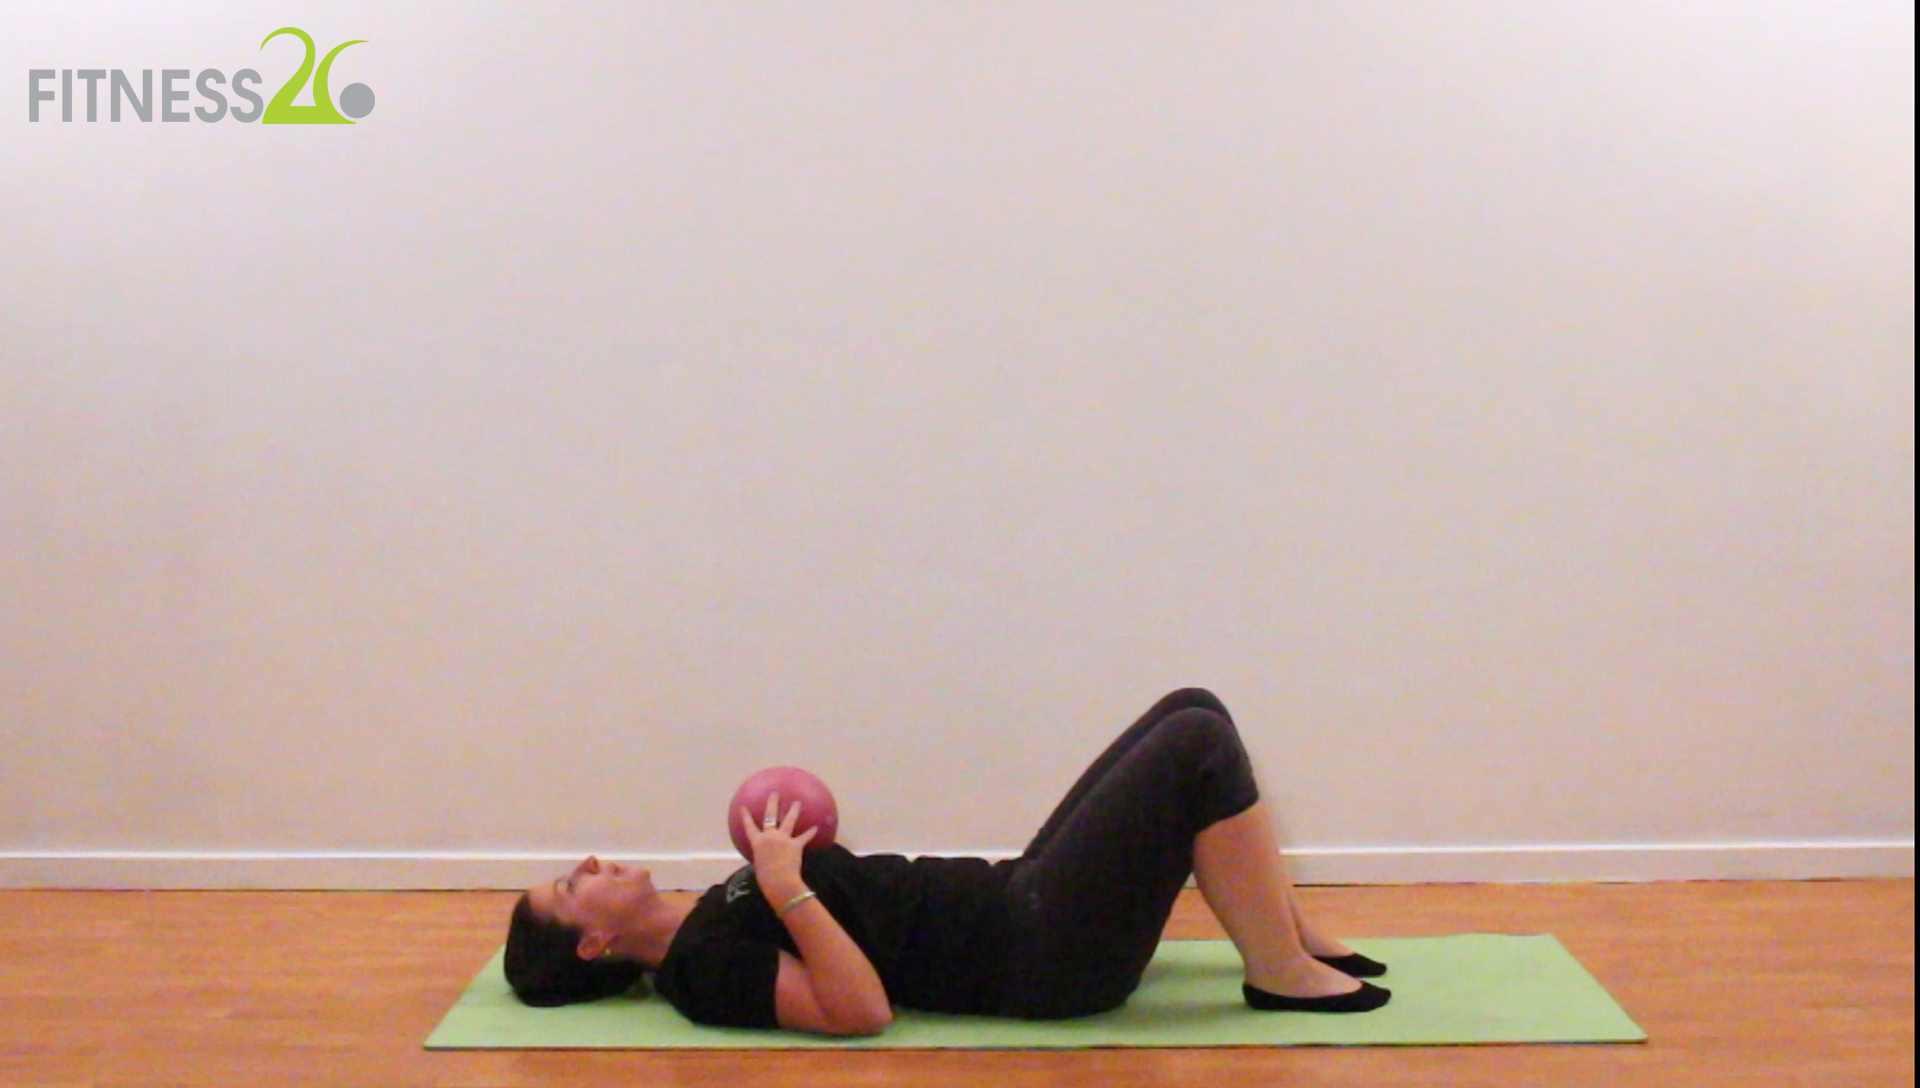 Megan – Basic Pilates Session using a Small ball